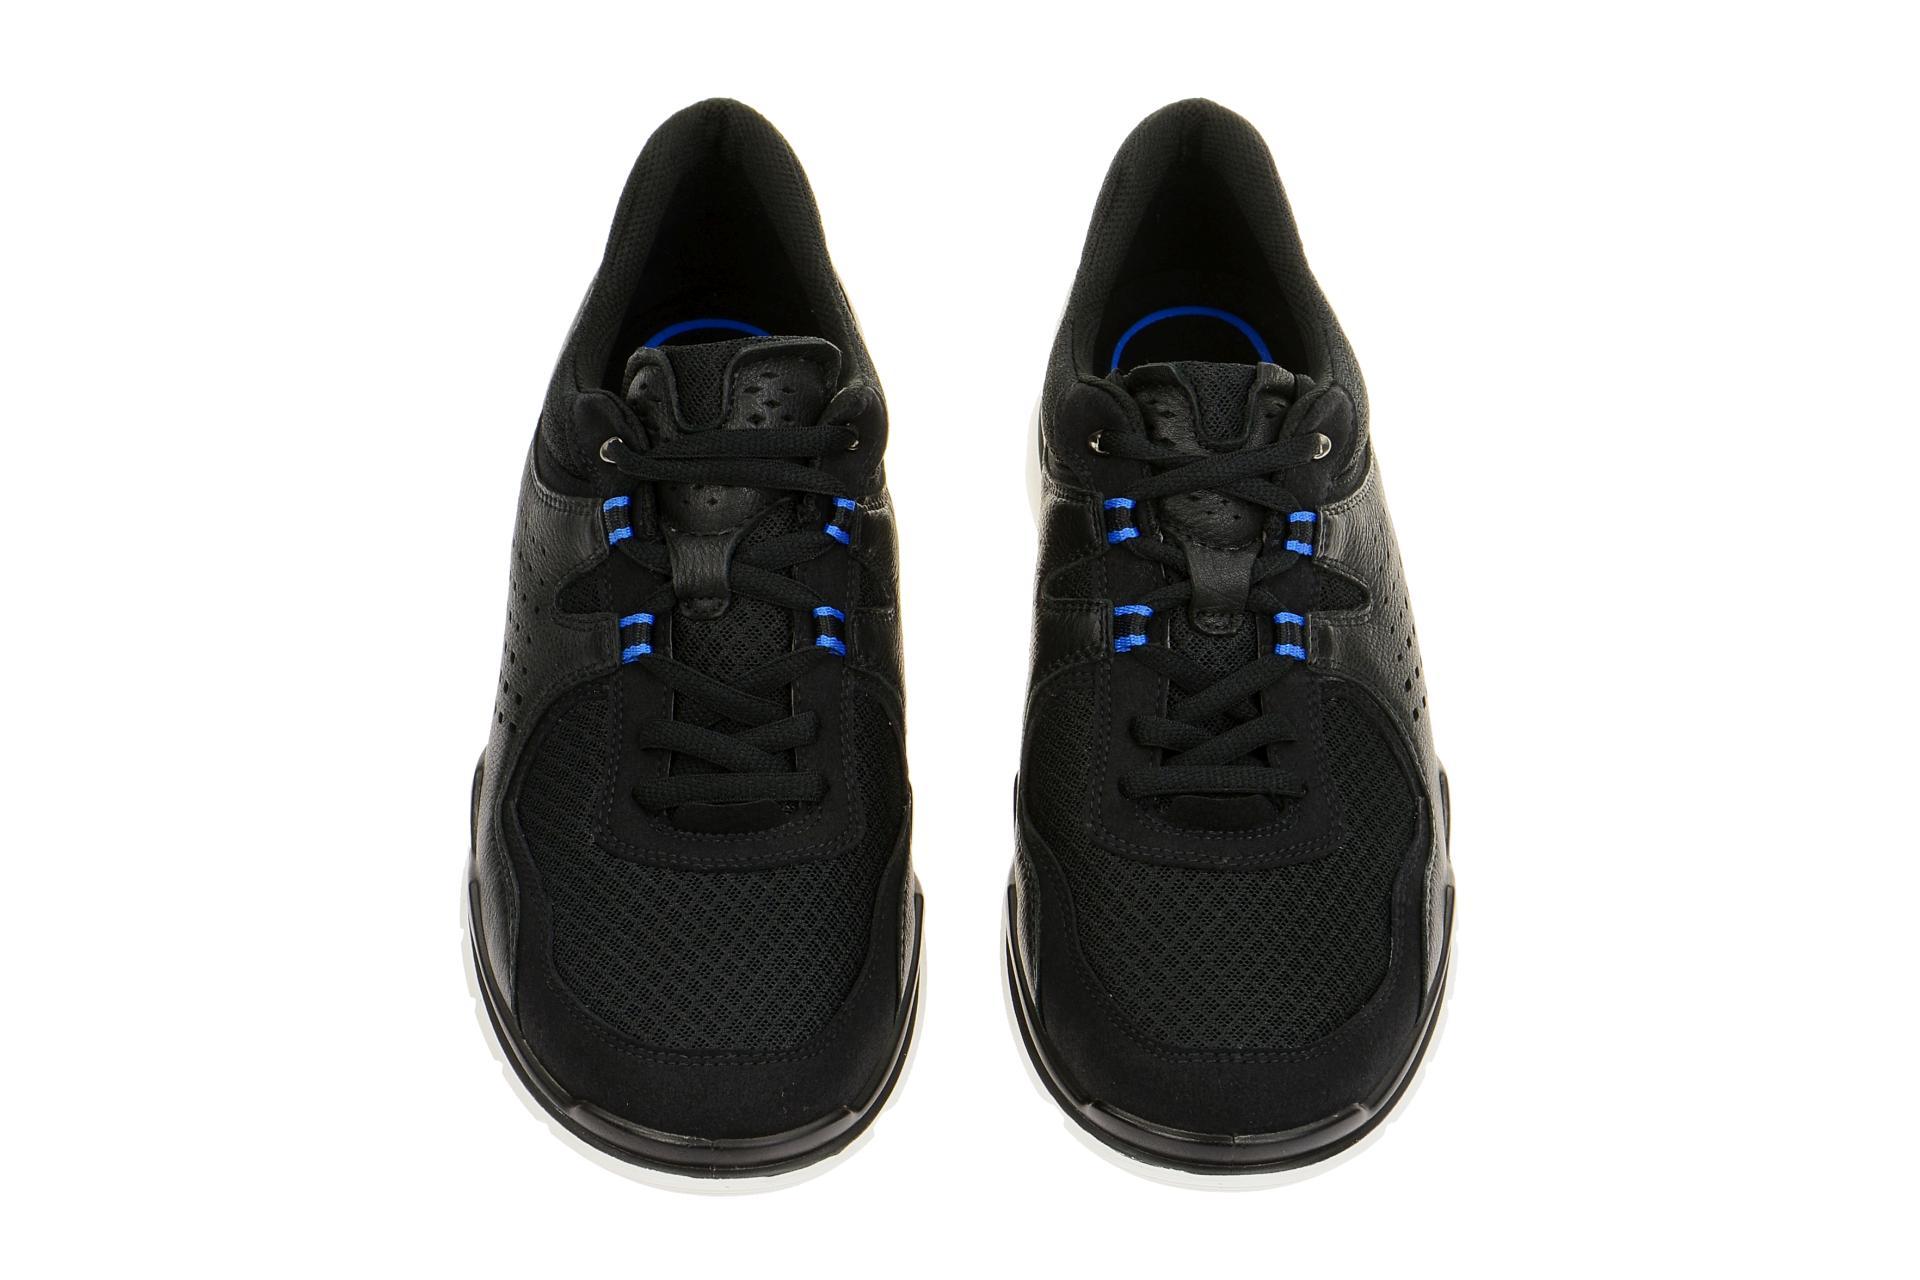 ecco lynx schuhe schwarz sneakers gr 42 43 schuhhaus strauch shop. Black Bedroom Furniture Sets. Home Design Ideas